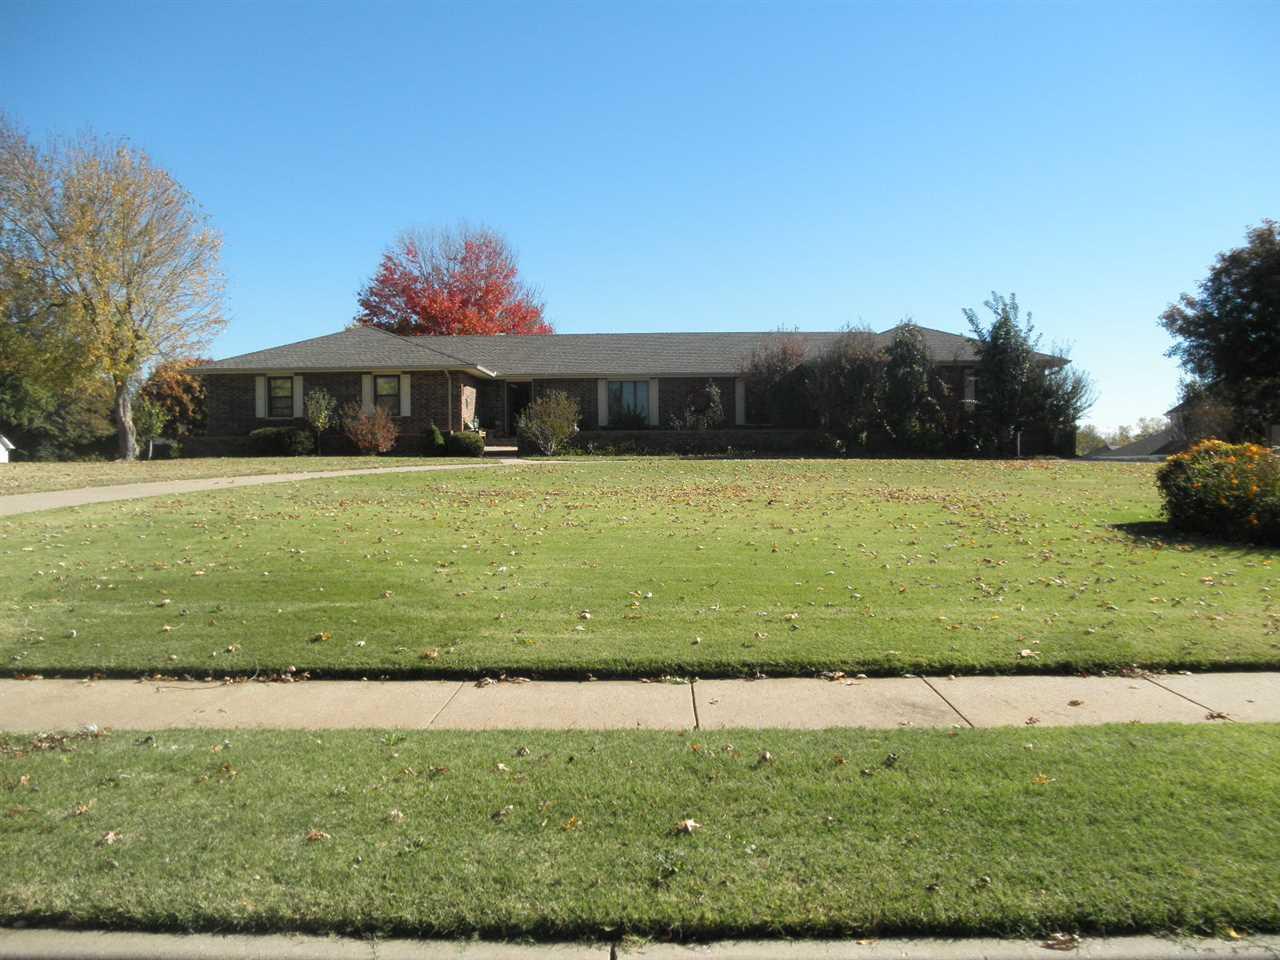 Sold Cross Sale W/ MLS | 1305 Meadowbrook Ponca City, OK 74604 0